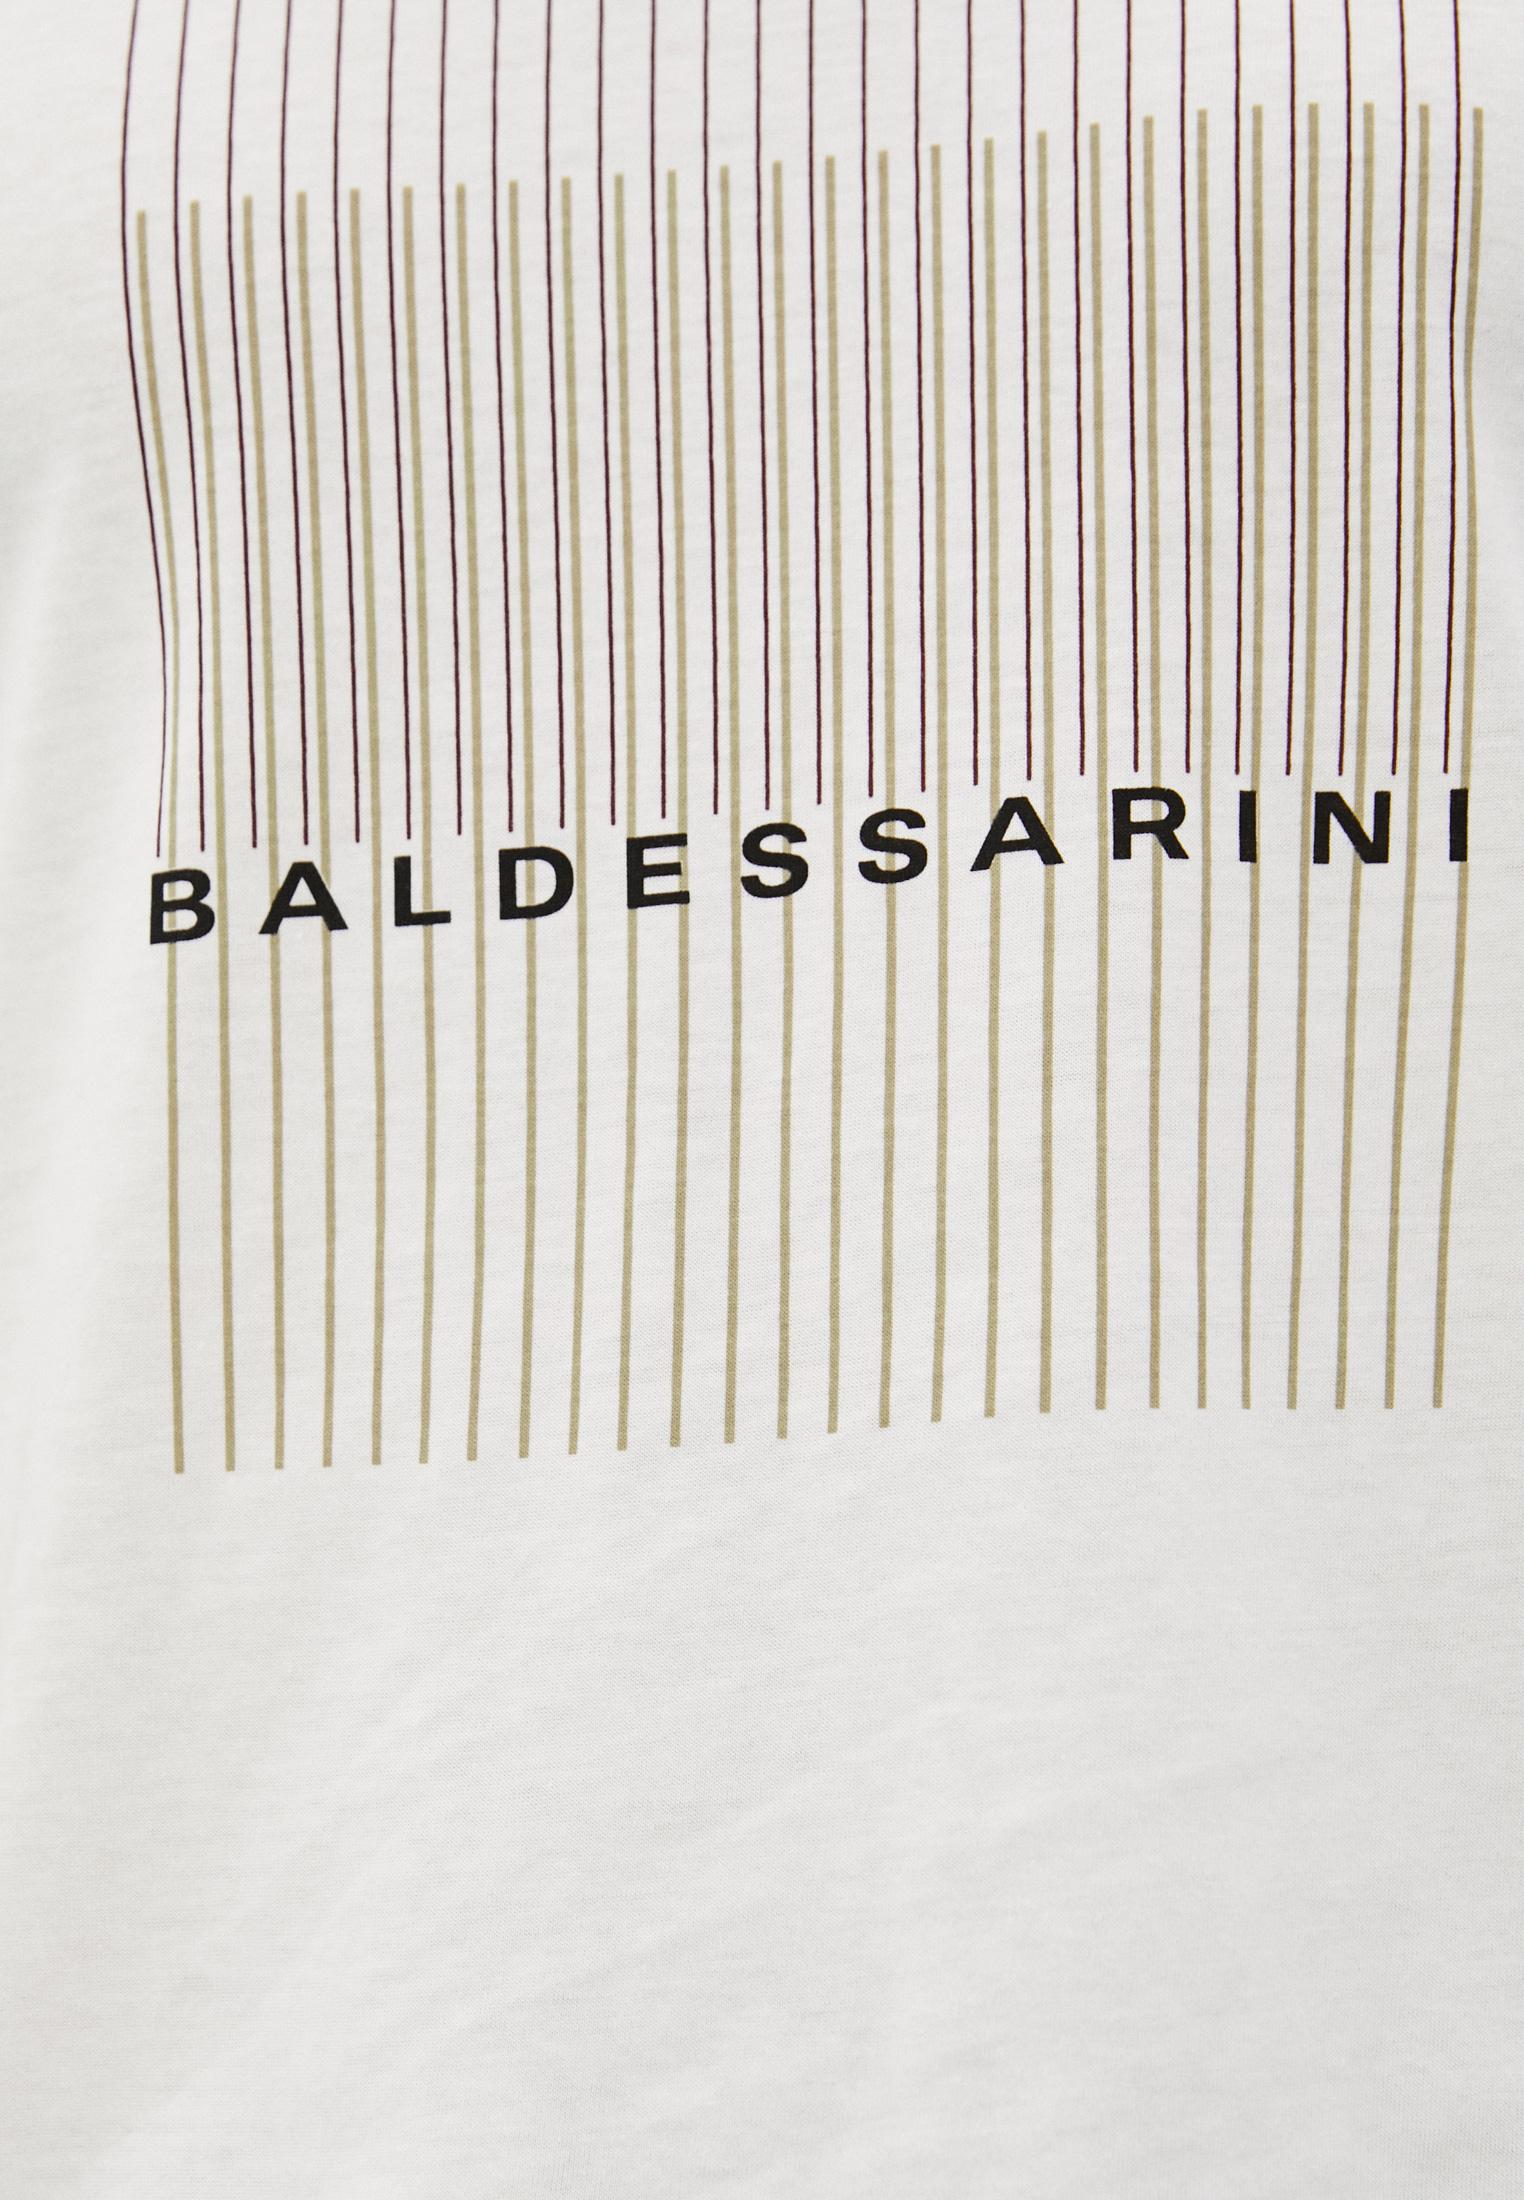 Футболка BALDESSARINI (Балдессарини) 20010.5015: изображение 5